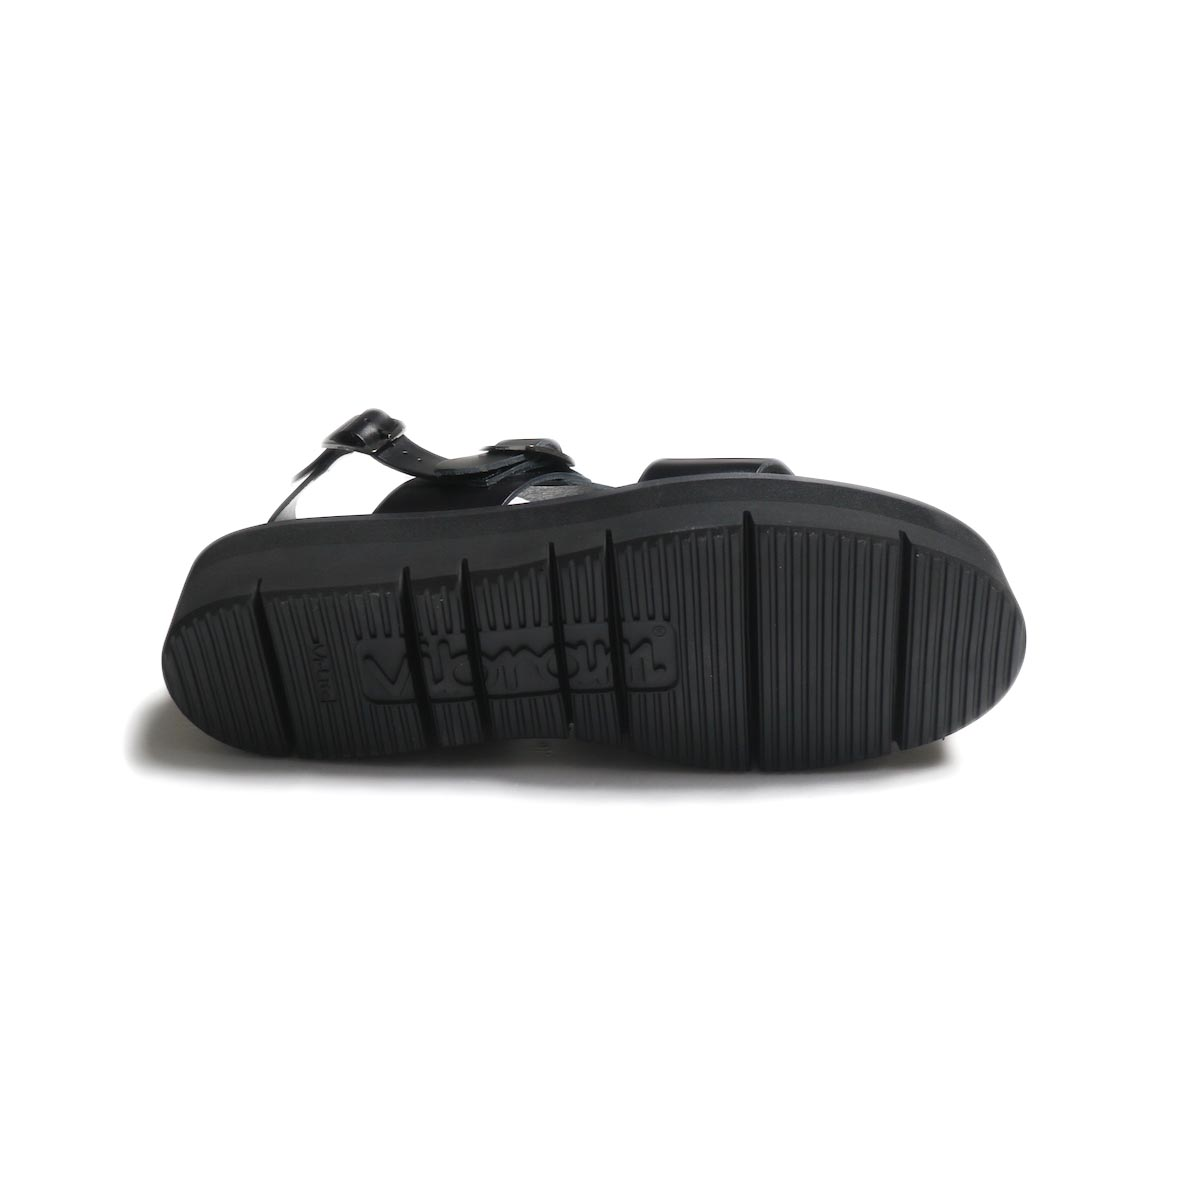 foot the coacher / SS BELT SANDALS (GLOXI CUT SOLE) -Black アウトソール